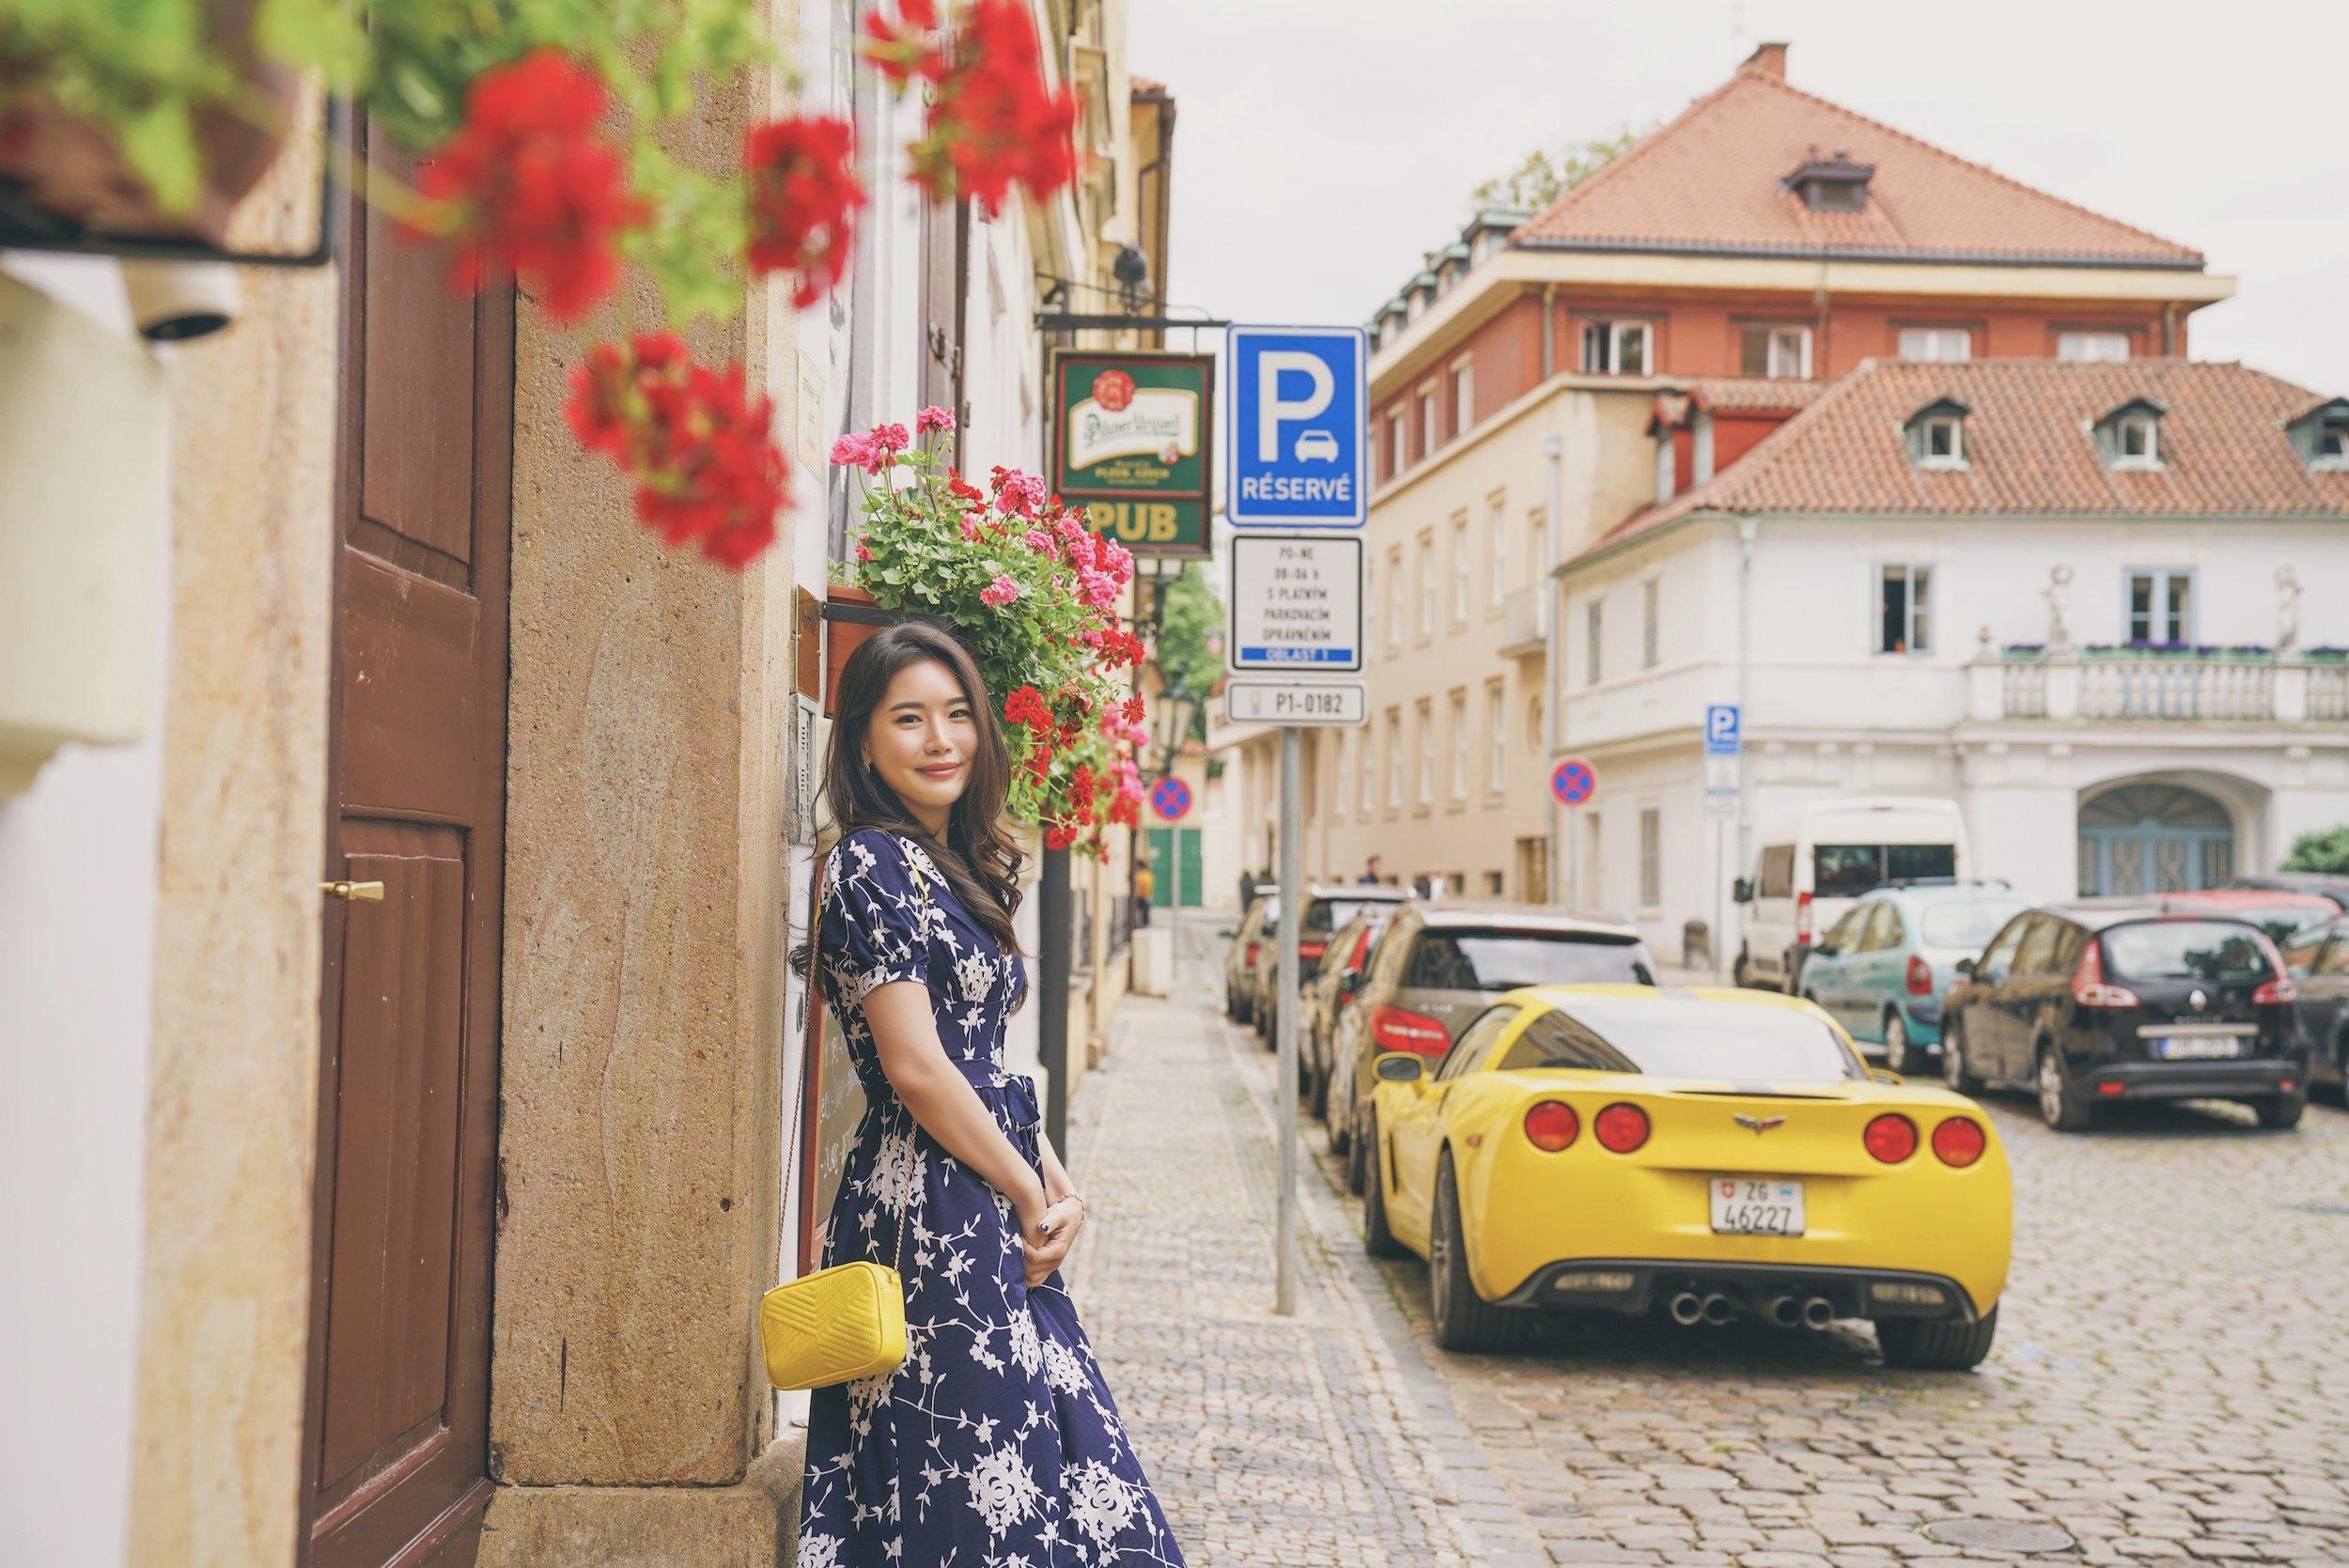 Sprazzi_Professional_Photography_Photographer_Prague_Czech-Republic_Irene_Original_16.jpg